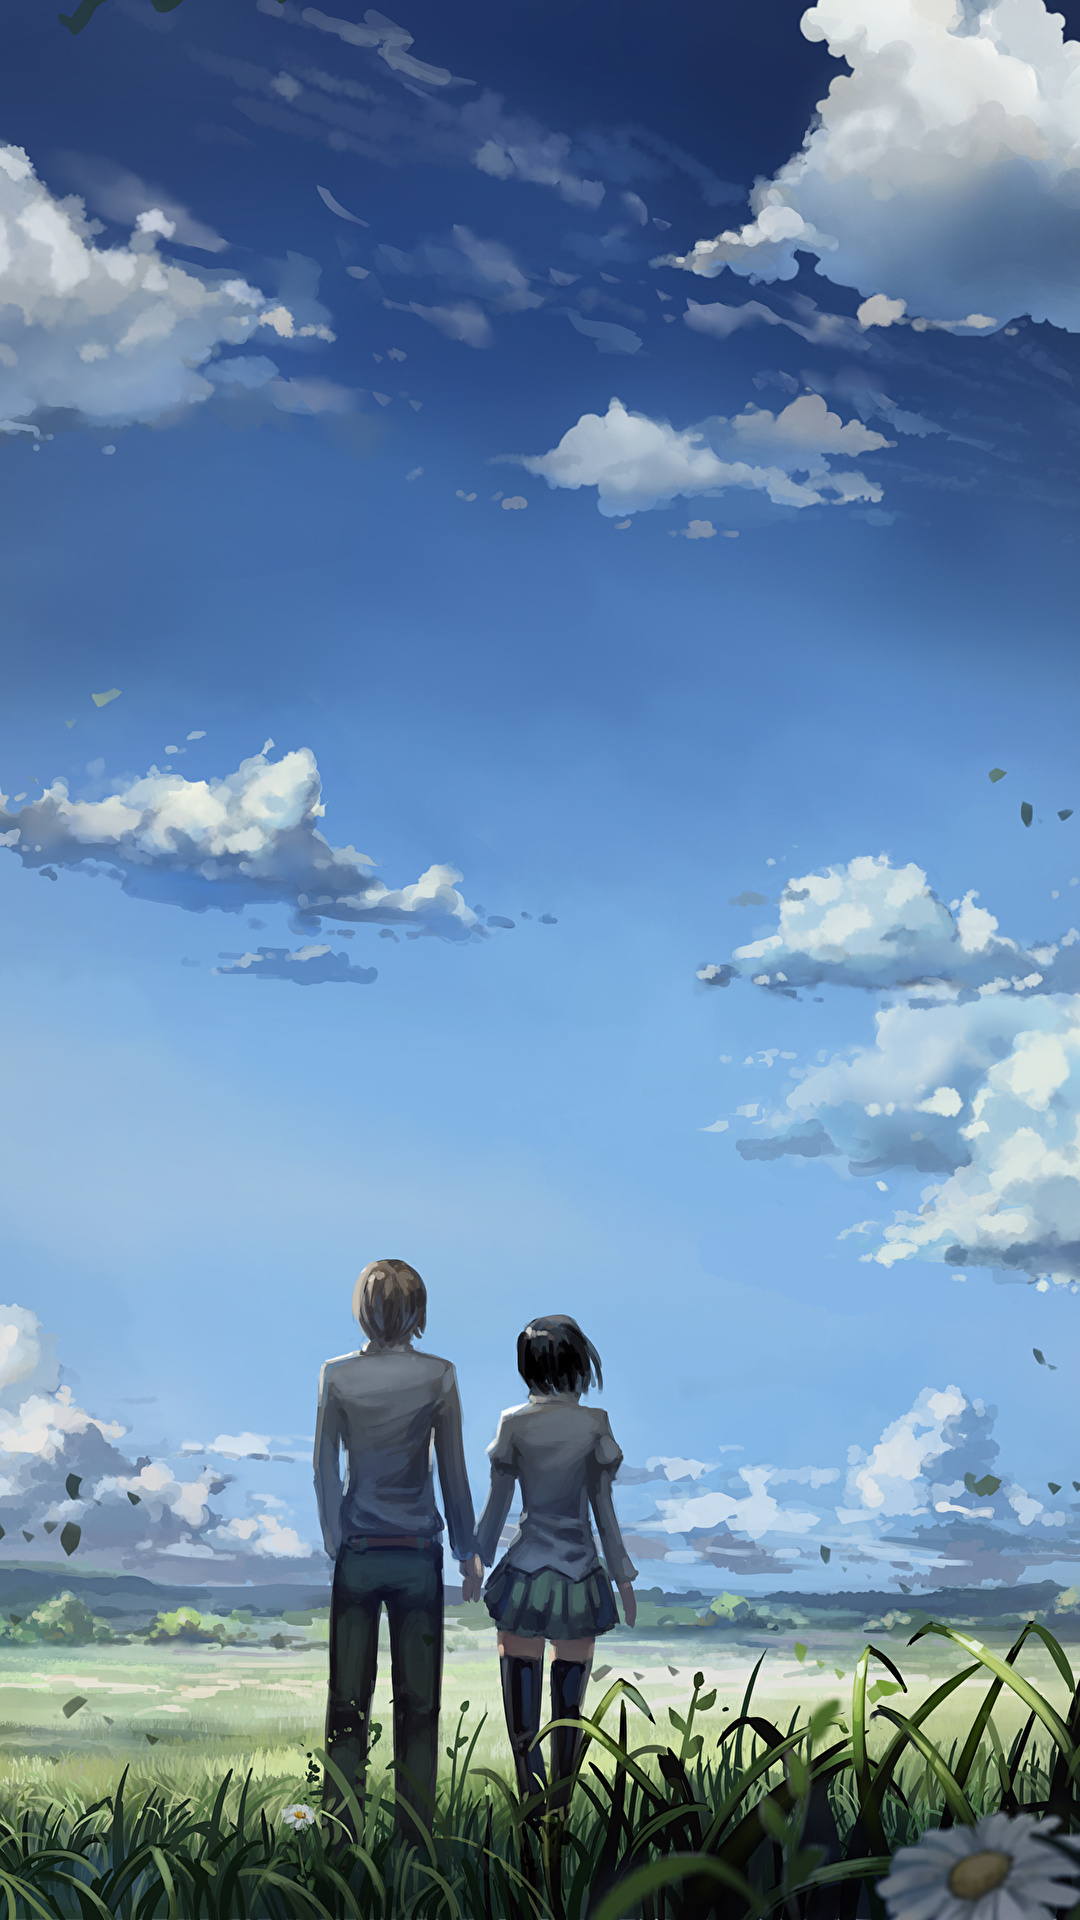 Unduh 5300 Wallpaper Anime Hd 1080 X 1920 HD Gratid